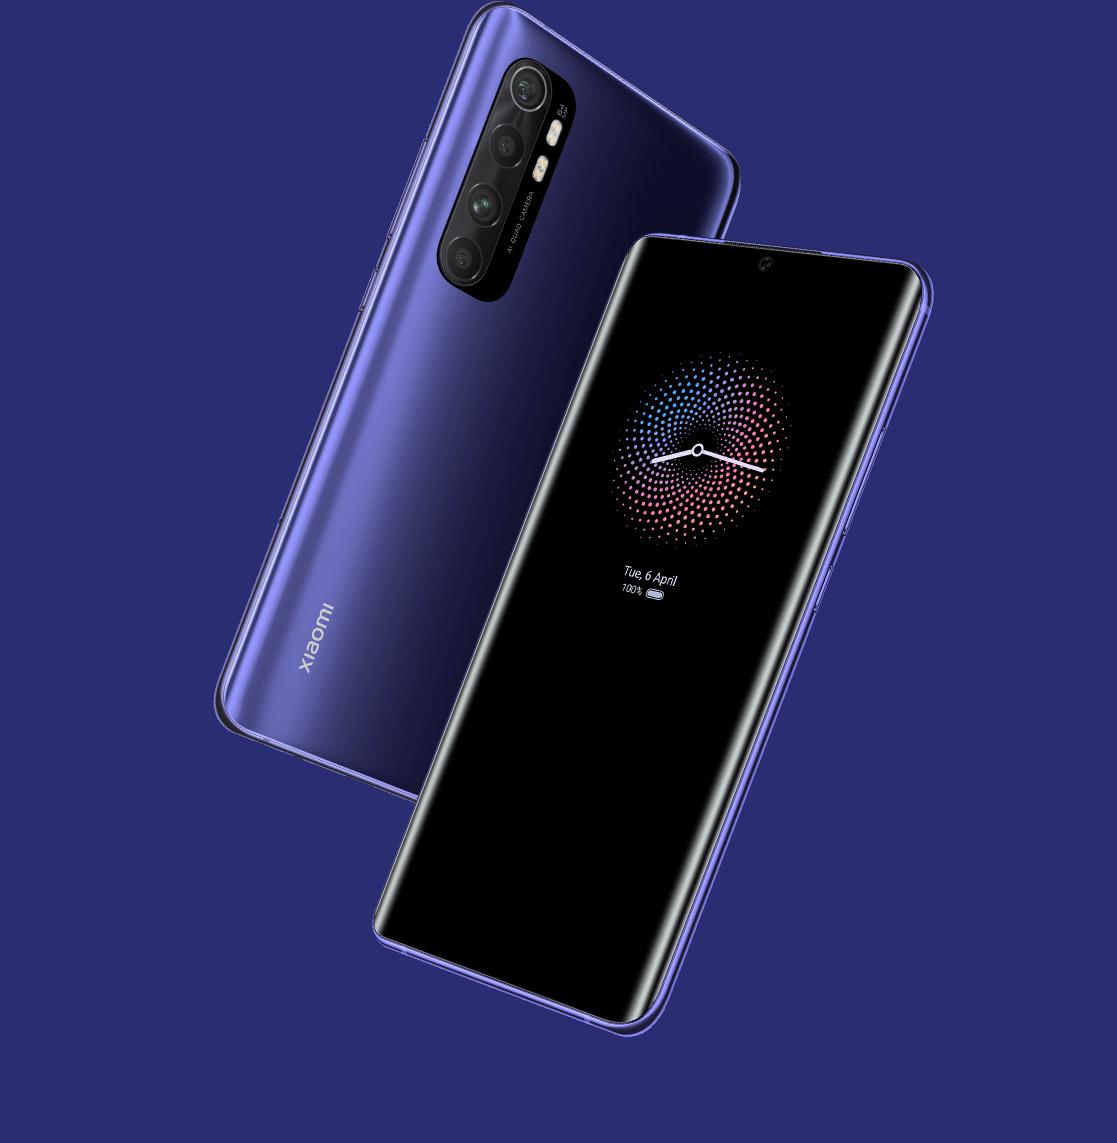 xiaomi-mi-note-10-lite-6128-okostelefon-t13